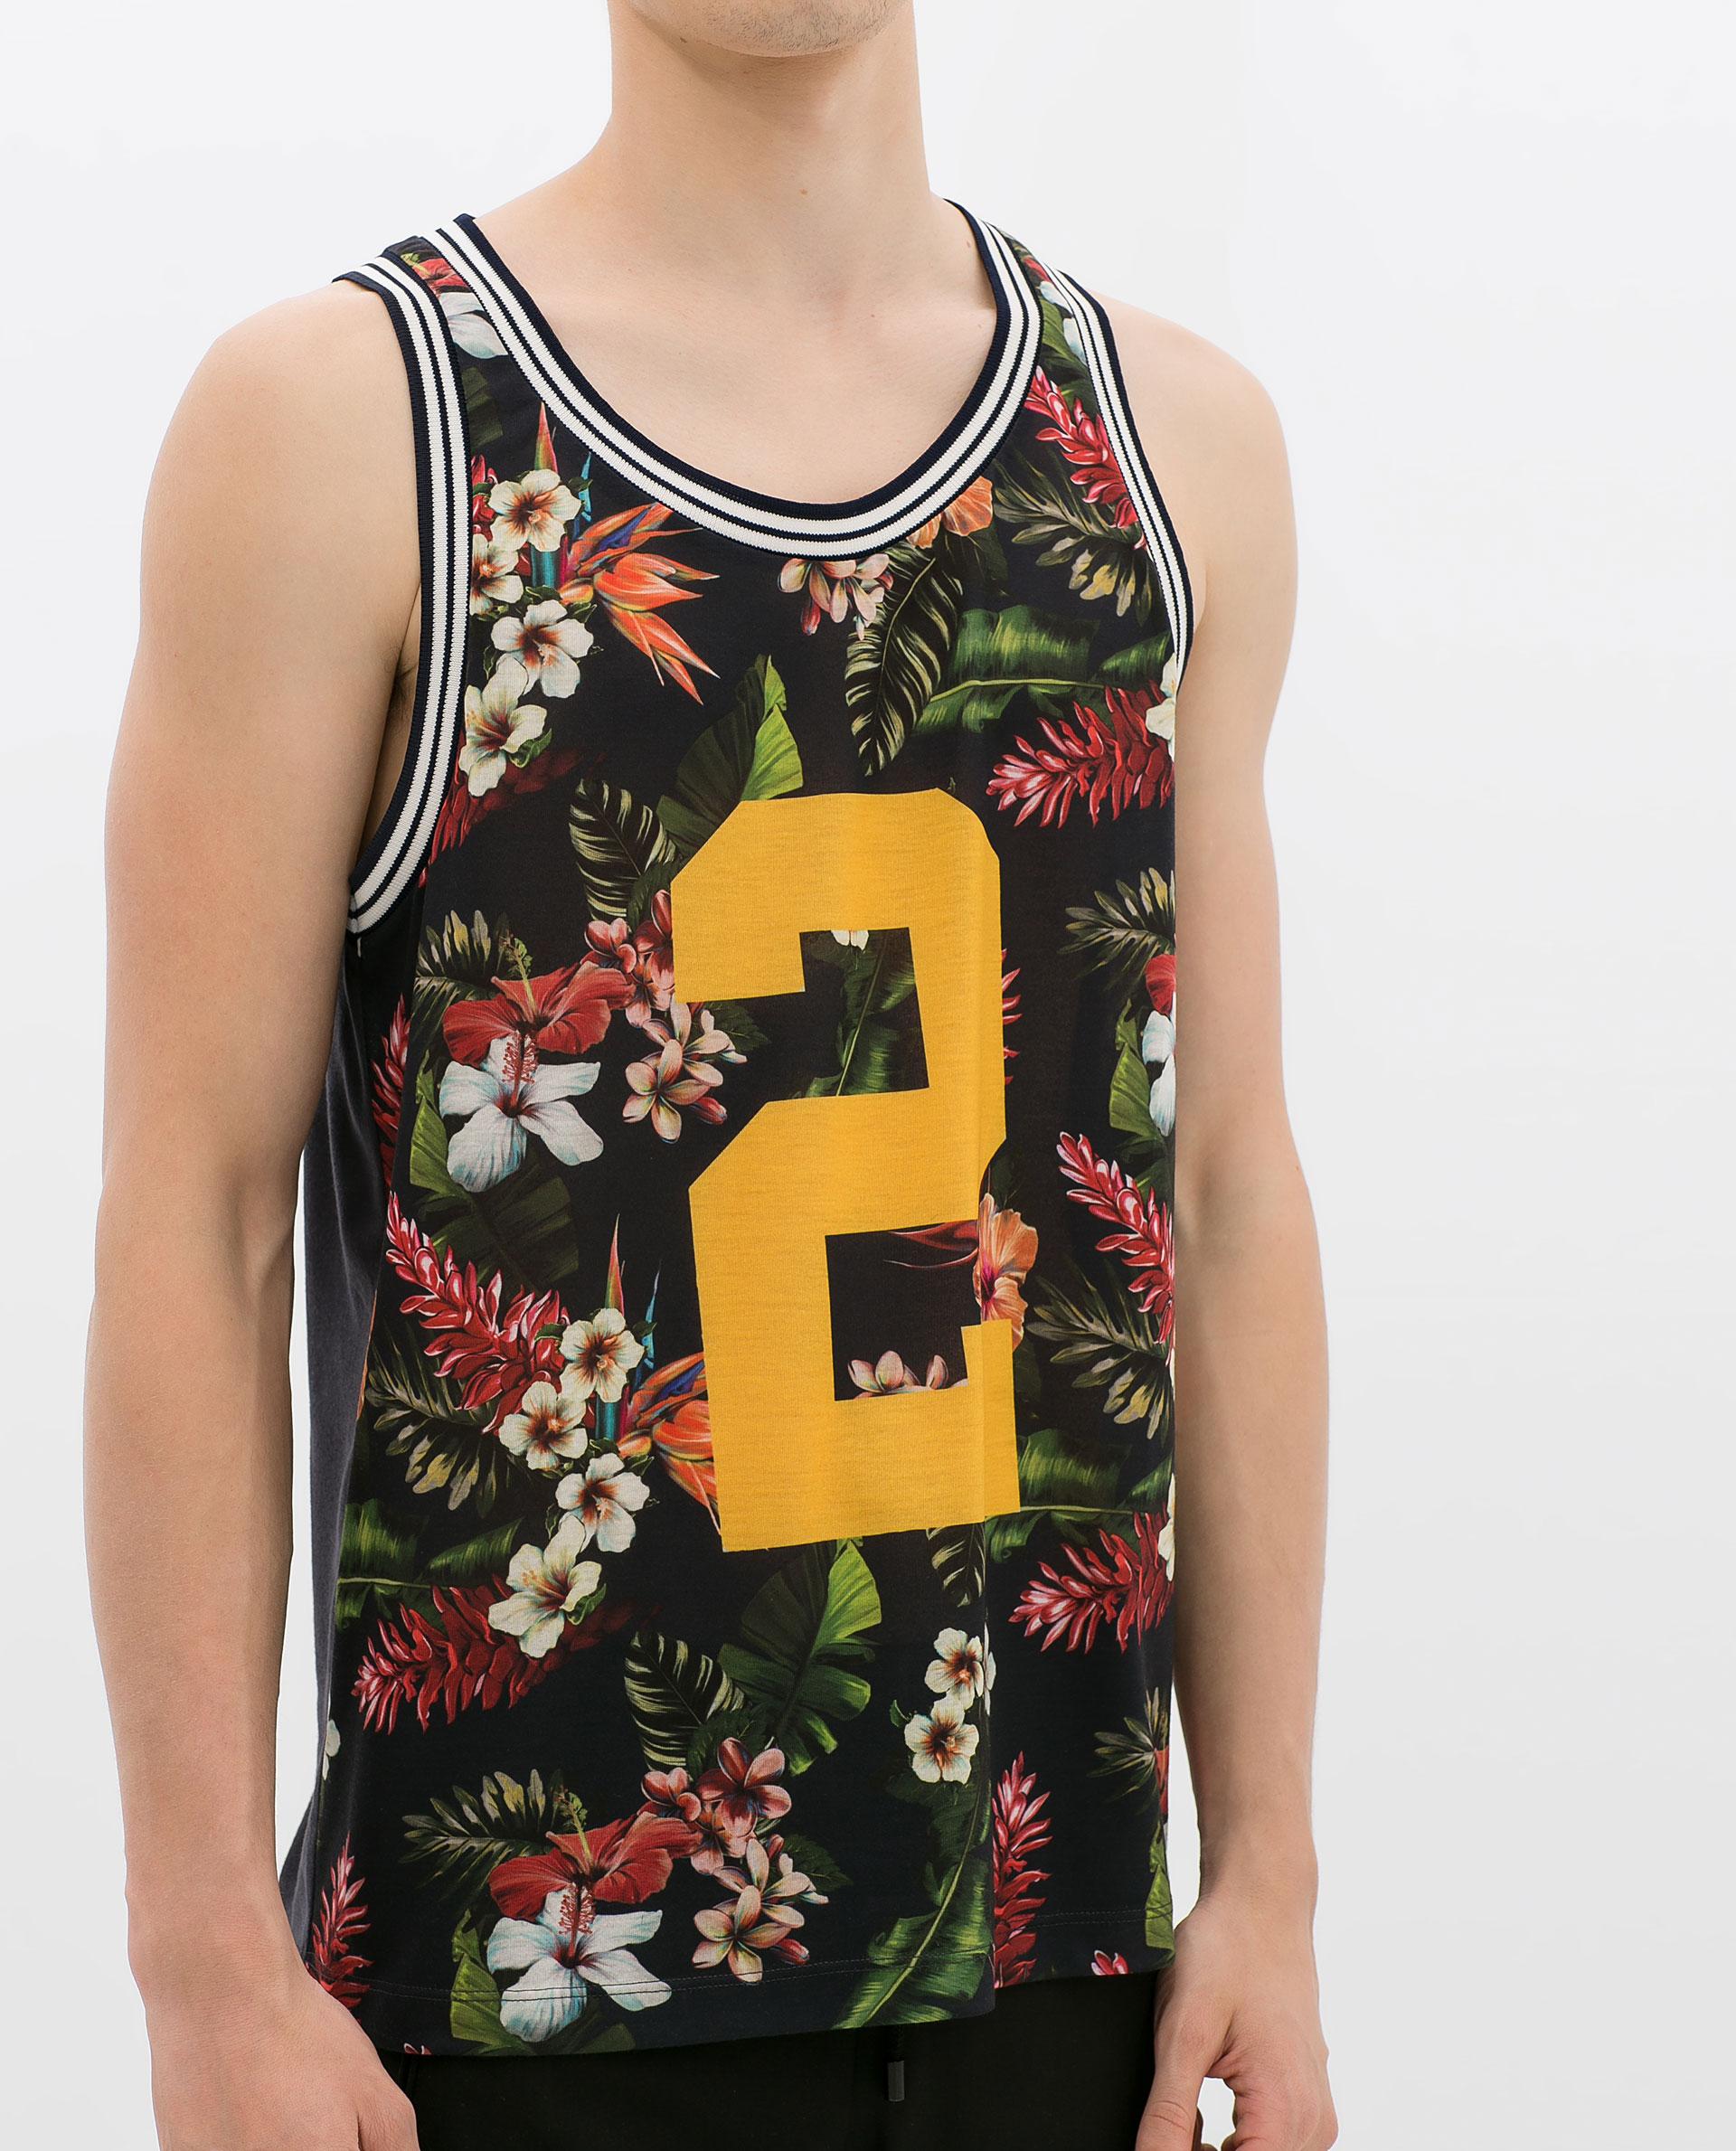 Zara floral tshirt with number in floral for men navy for Zara mens floral shirt